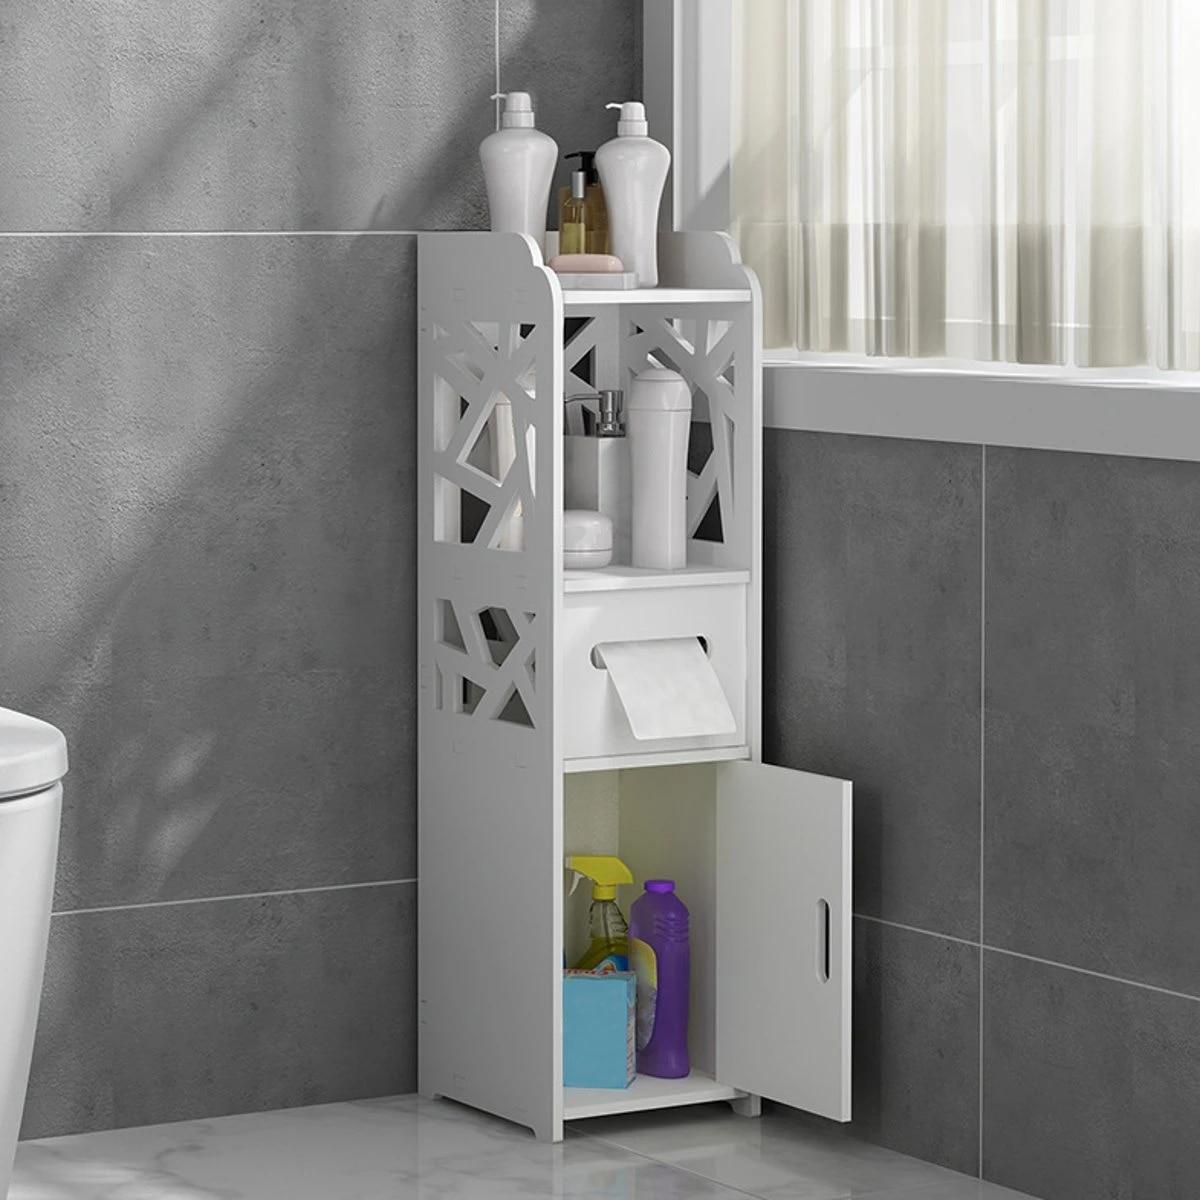 Small Bathroom Storage Corner Floor Cabinet With Doors And Shelves Thin Toilet Vanity Cabinet Narrow Bath Sink Organizer Storage Holders Racks Aliexpress